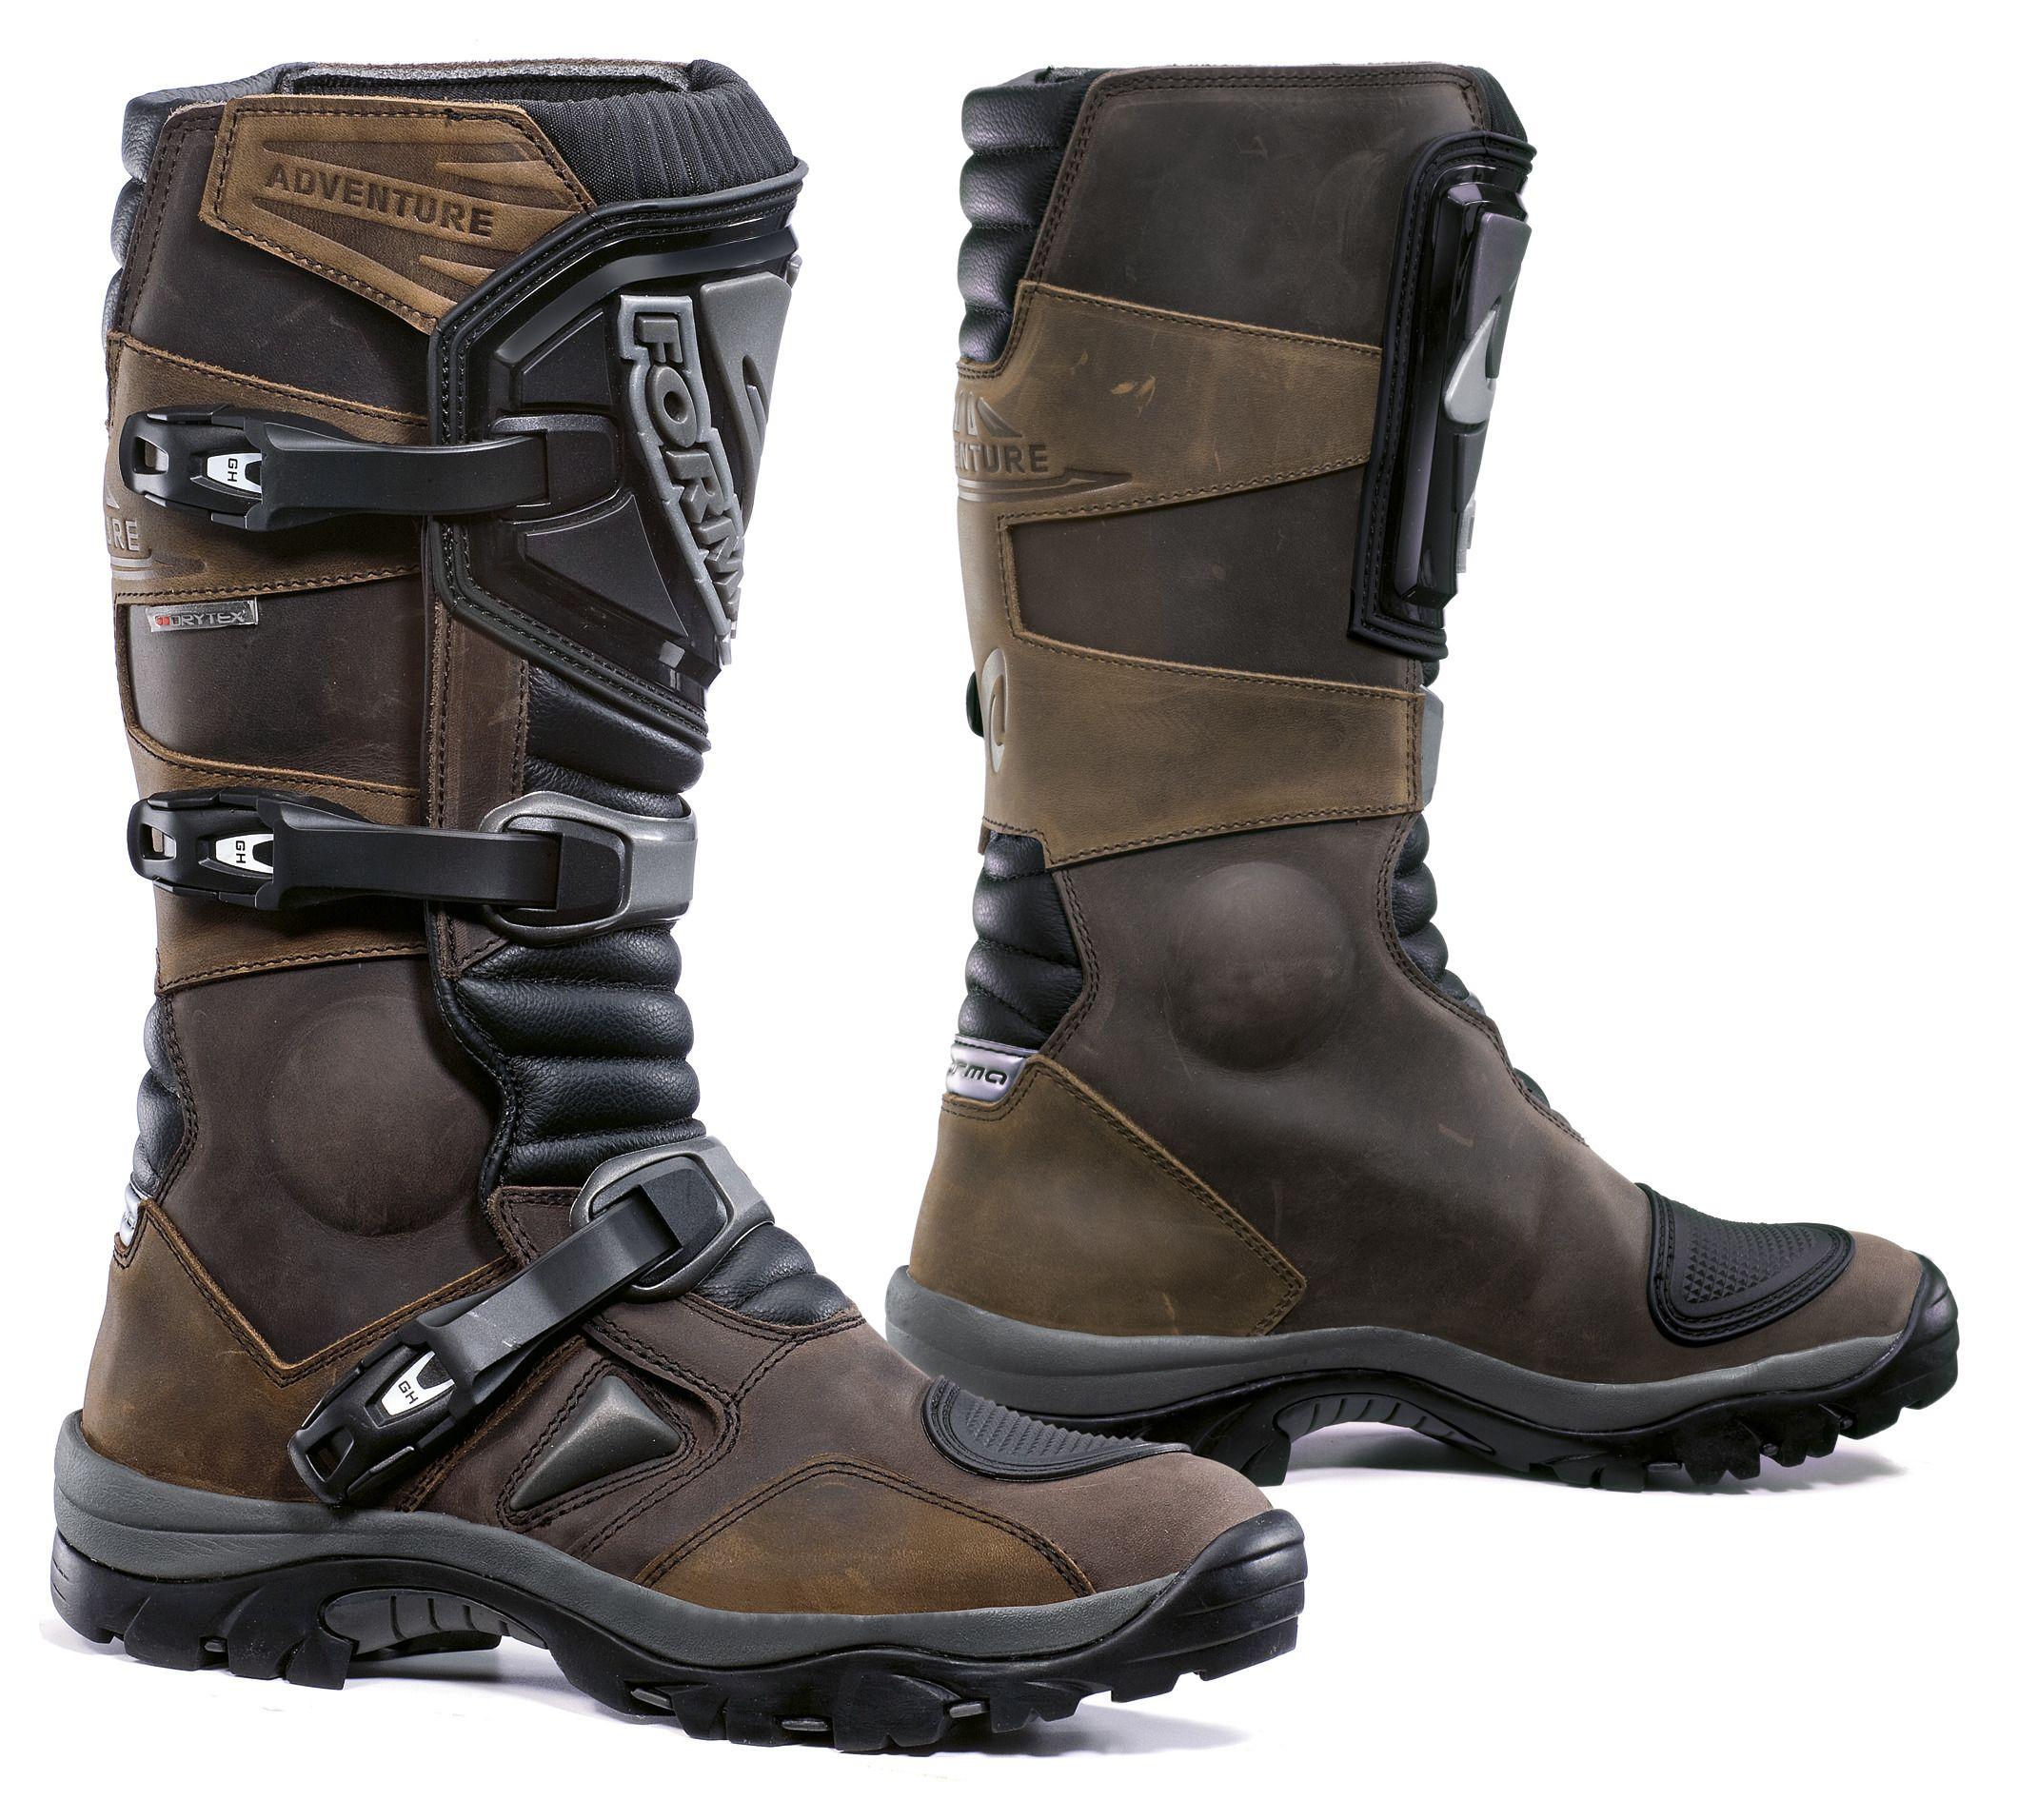 forma_adventure_boots.jpg